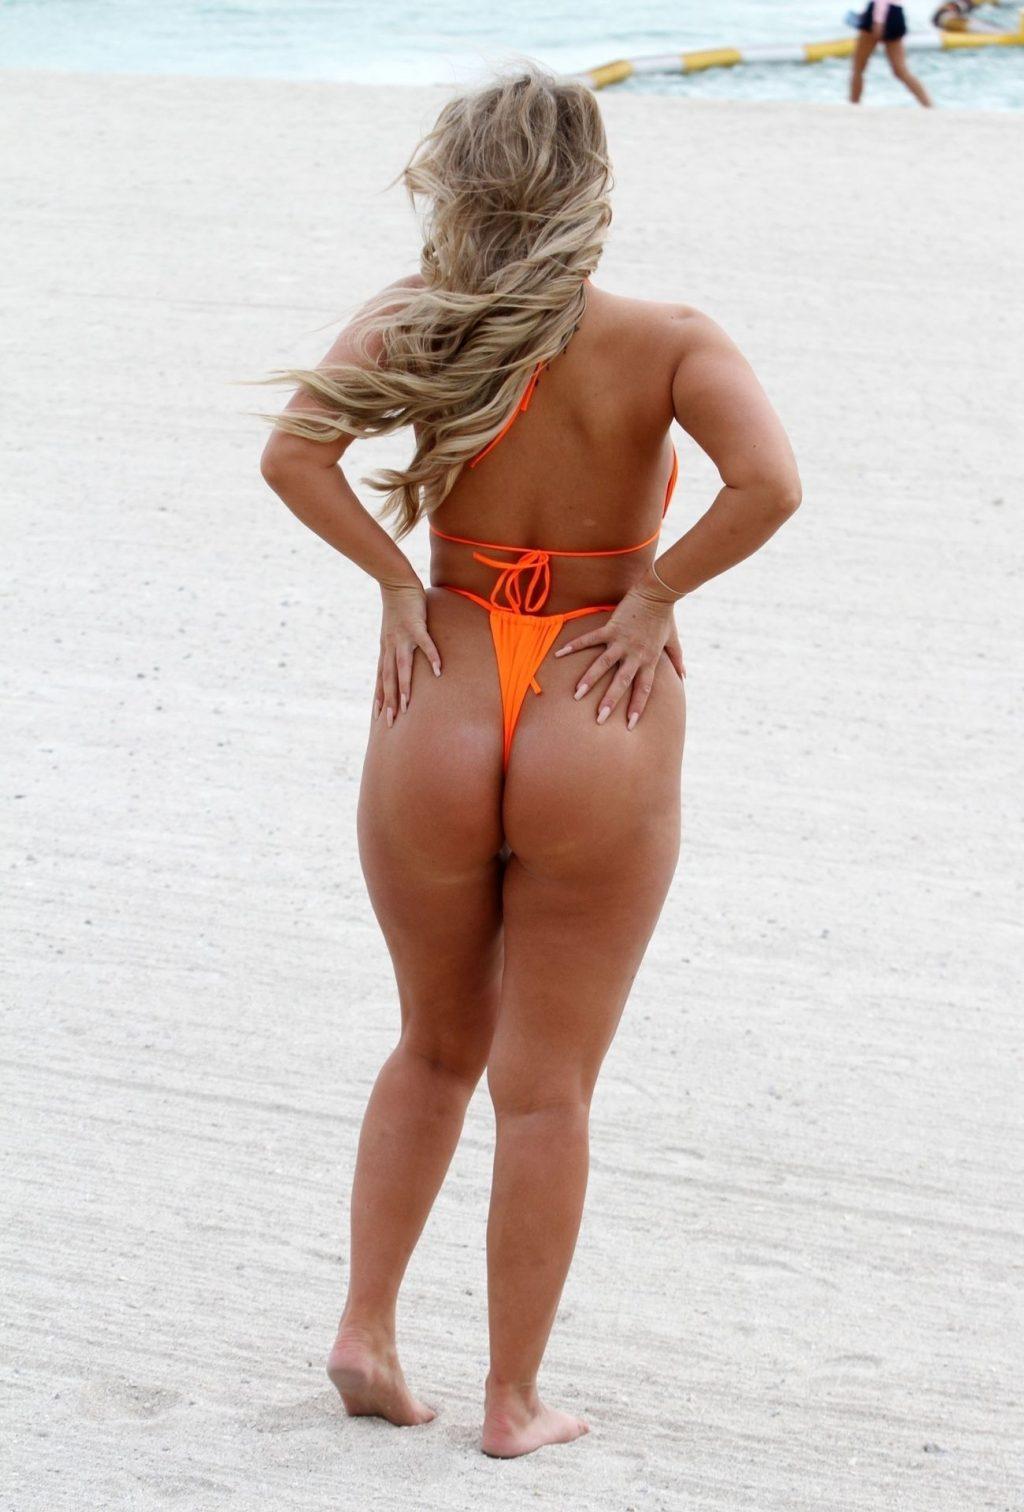 Bethan Kershaw Pictured Wearing a Bright Orange Bikini (12 Photos)